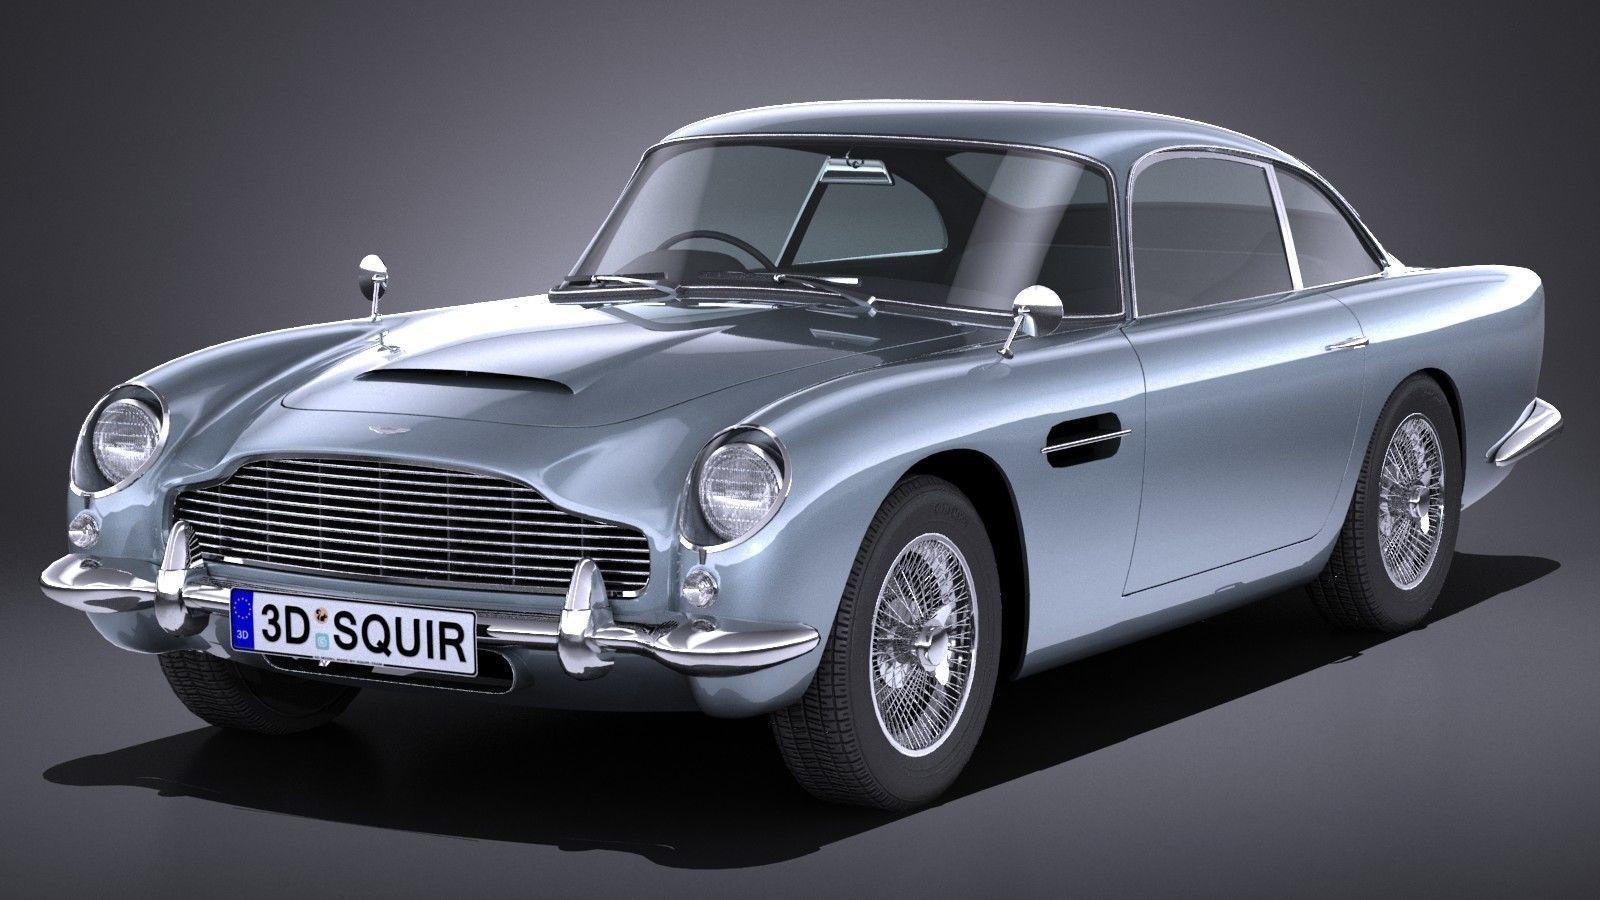 LowPoly Aston Martin DB5 1963